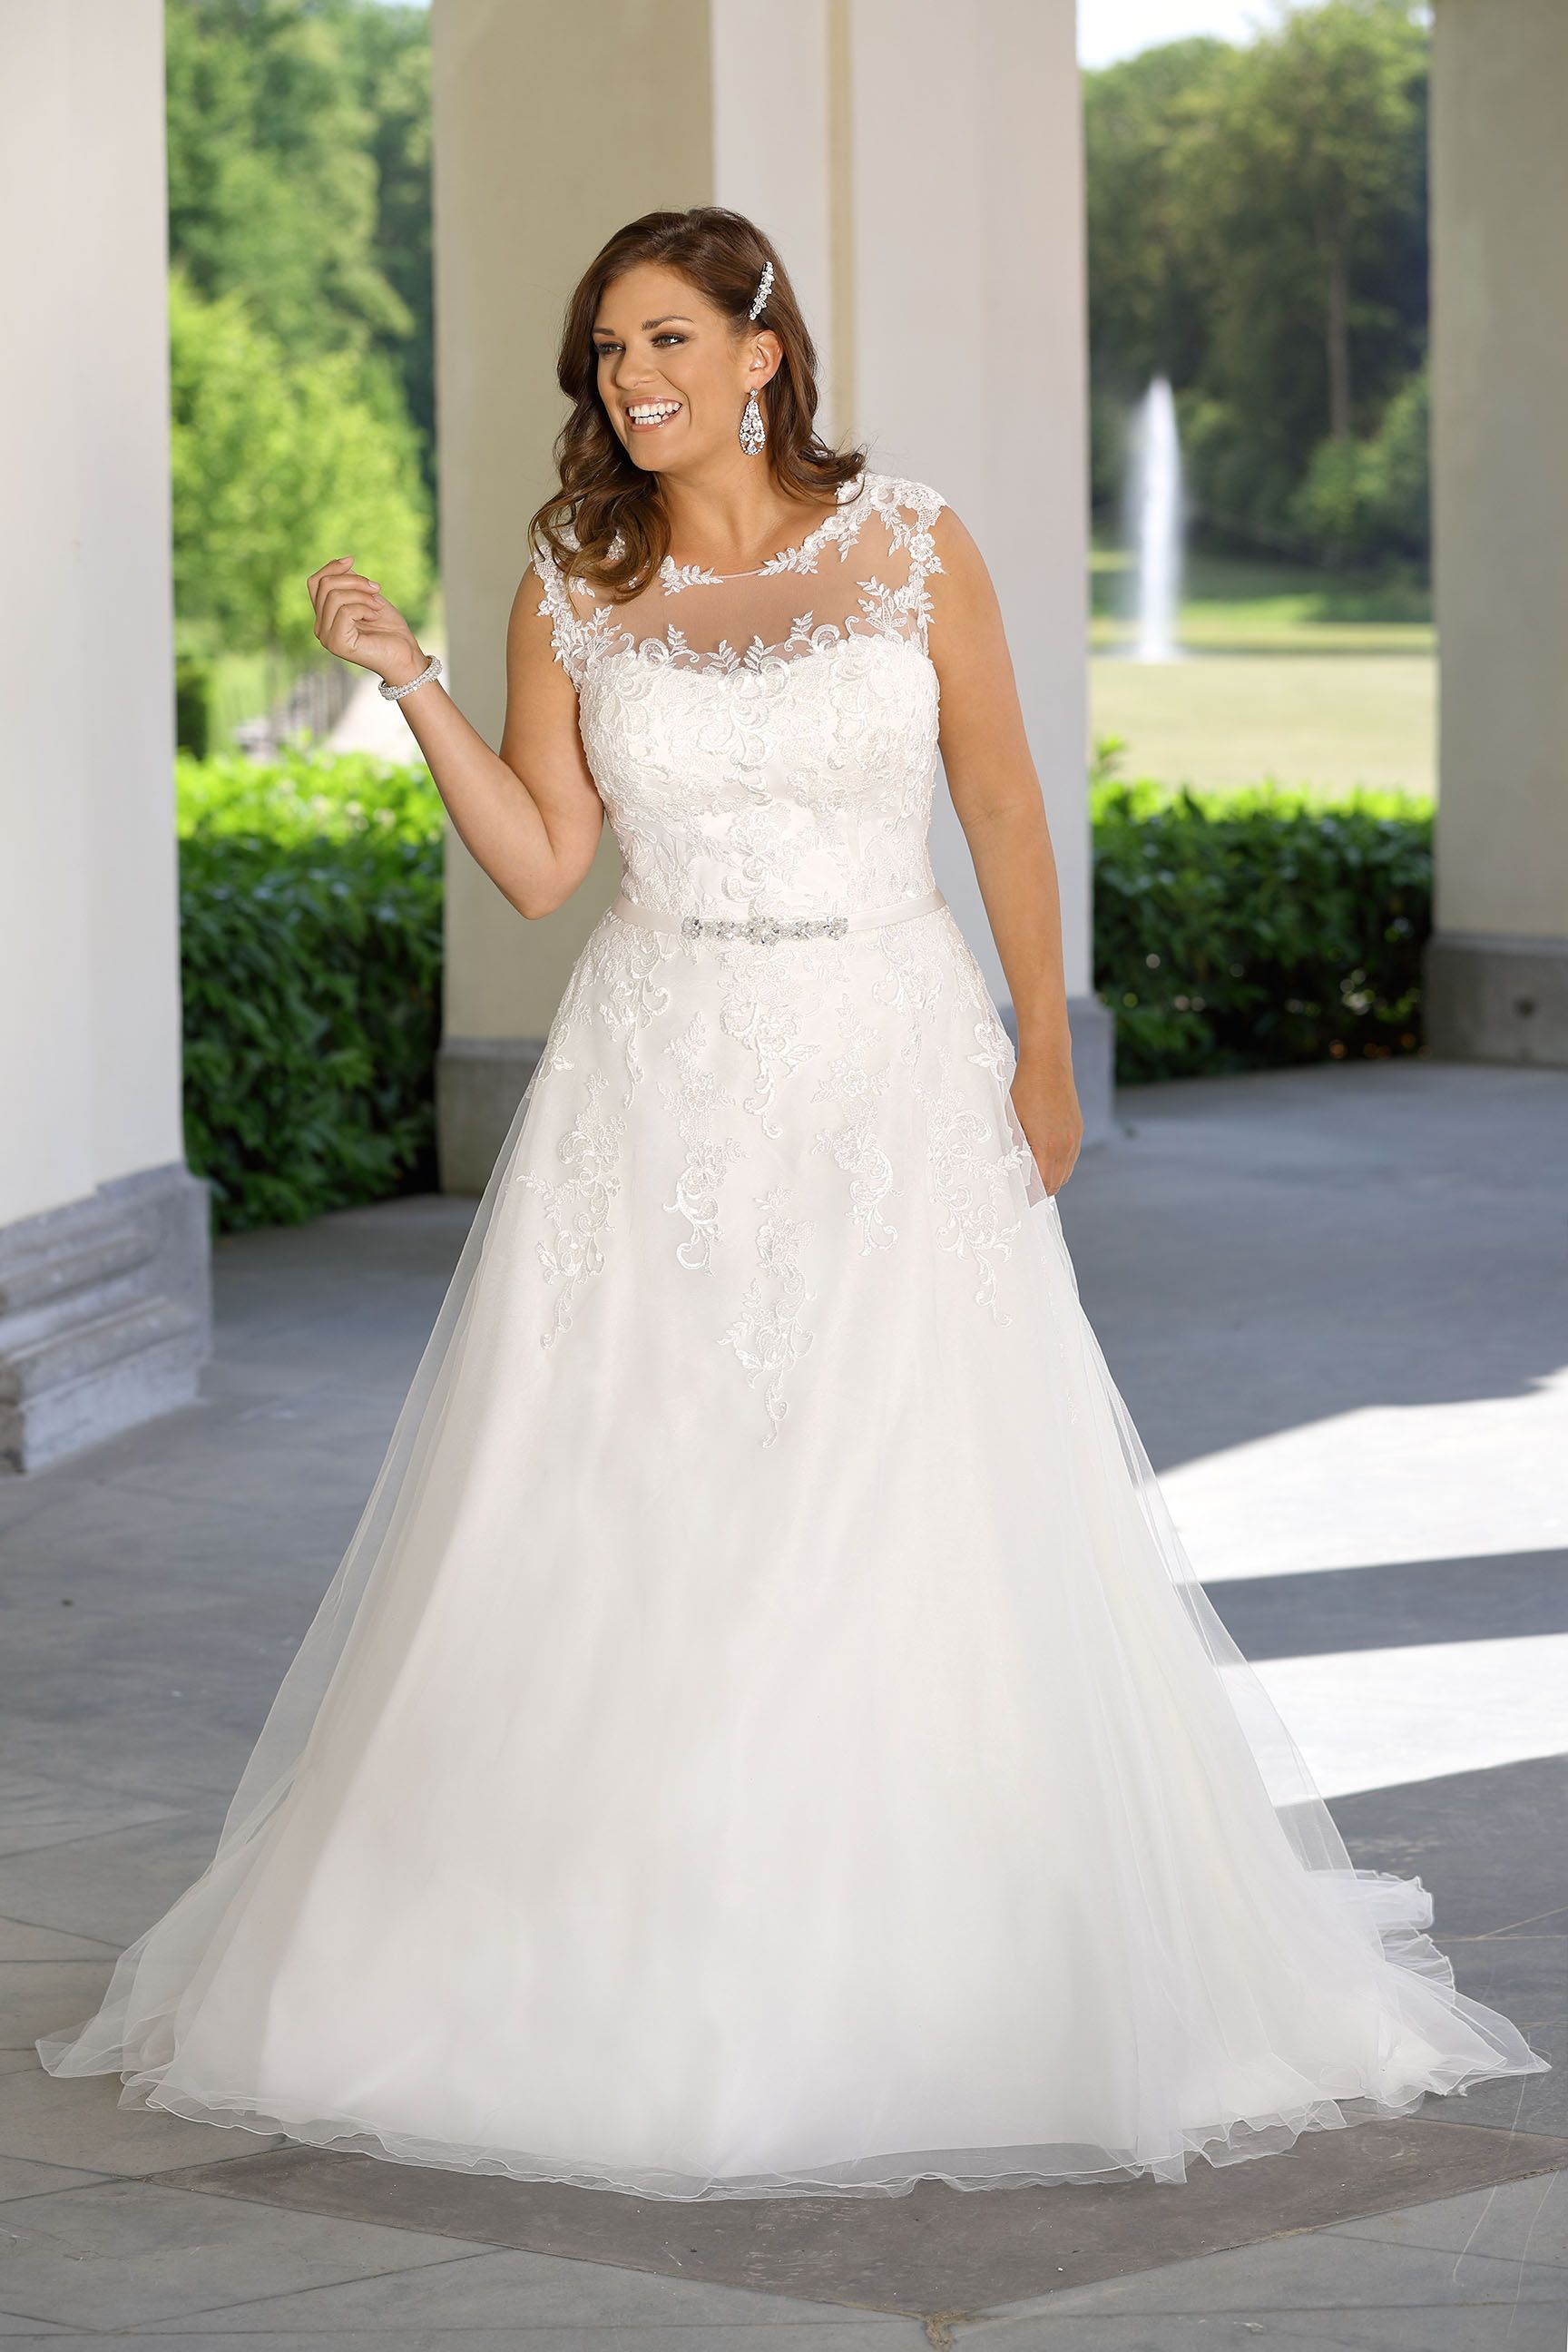 LS218014 - Ladybird Bruidsmode PlusSize | Hochzeitskleid | Pinterest